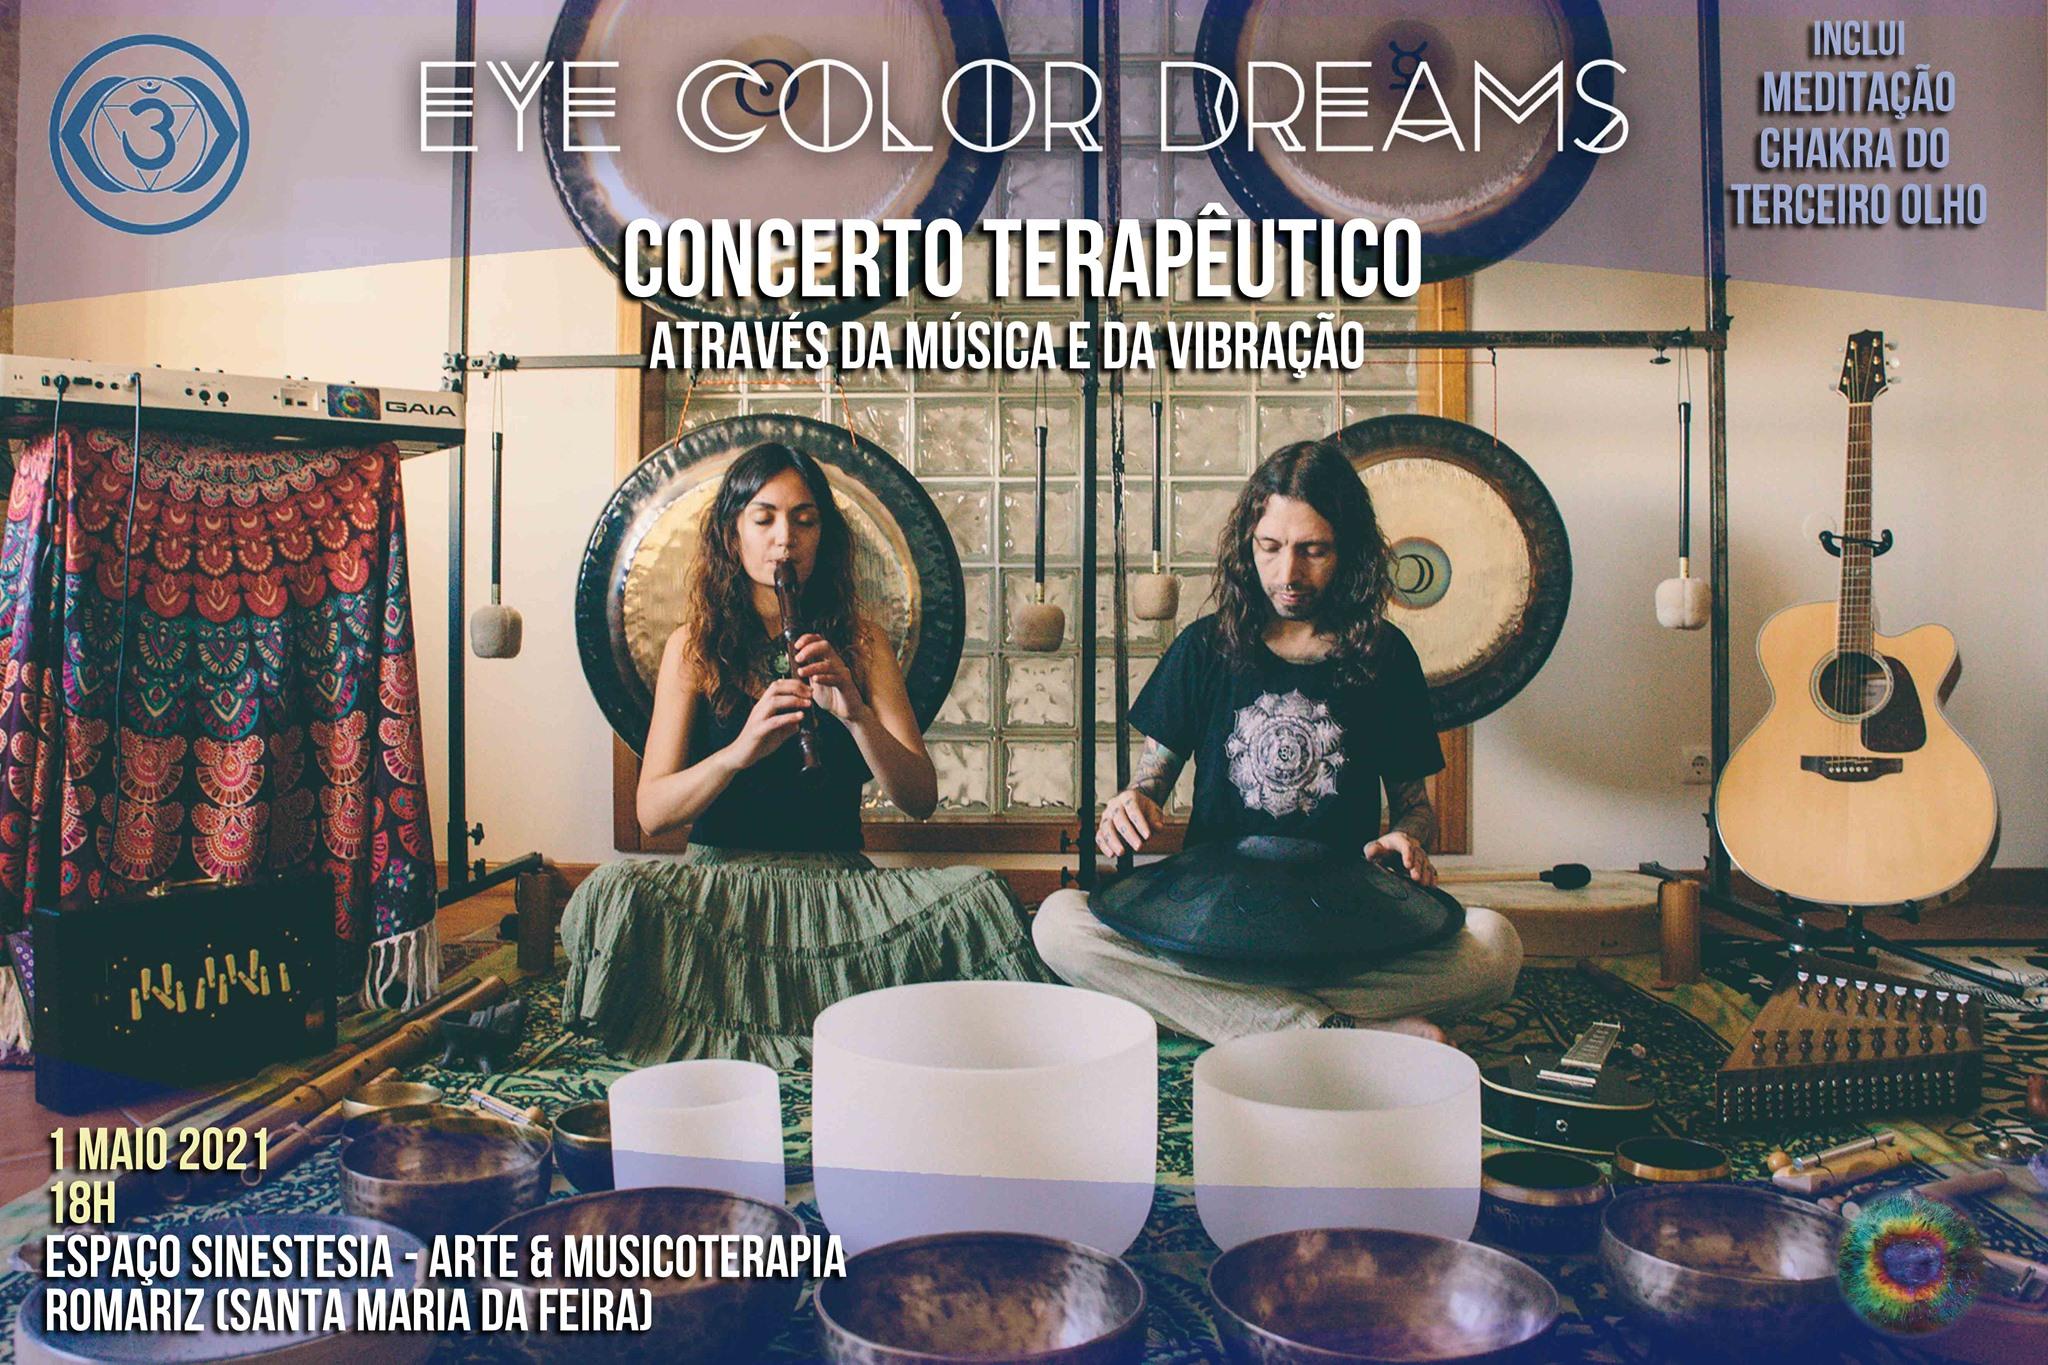 Lotado! Concerto Terapêutico (Chakra do Terceiro Olho) - Eye Color Dreams